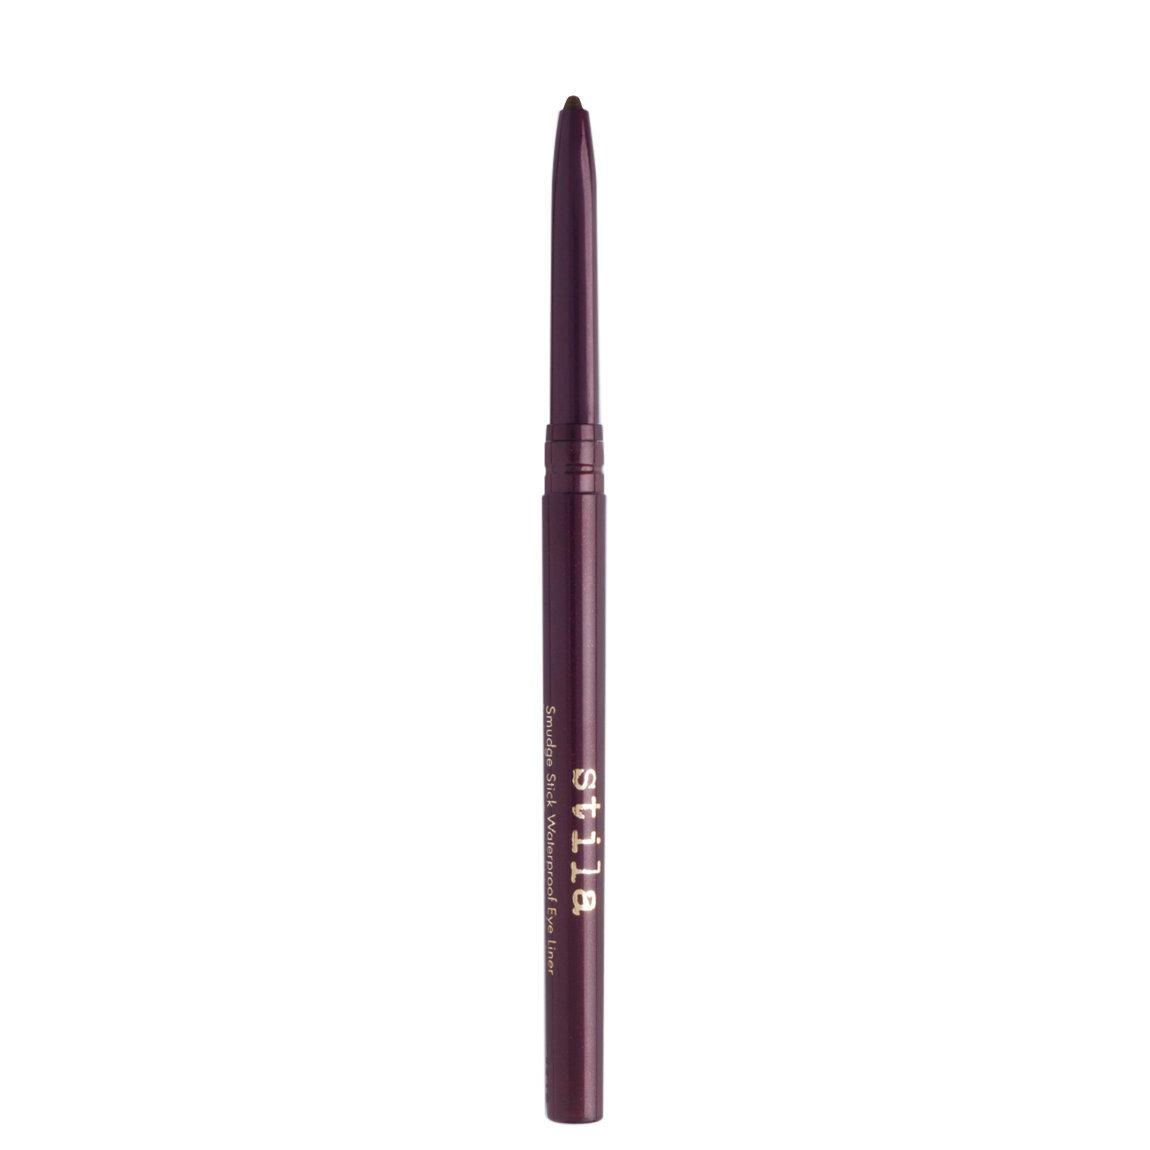 Stila Smudge Stick Waterproof Eyeliner Black Amethyst